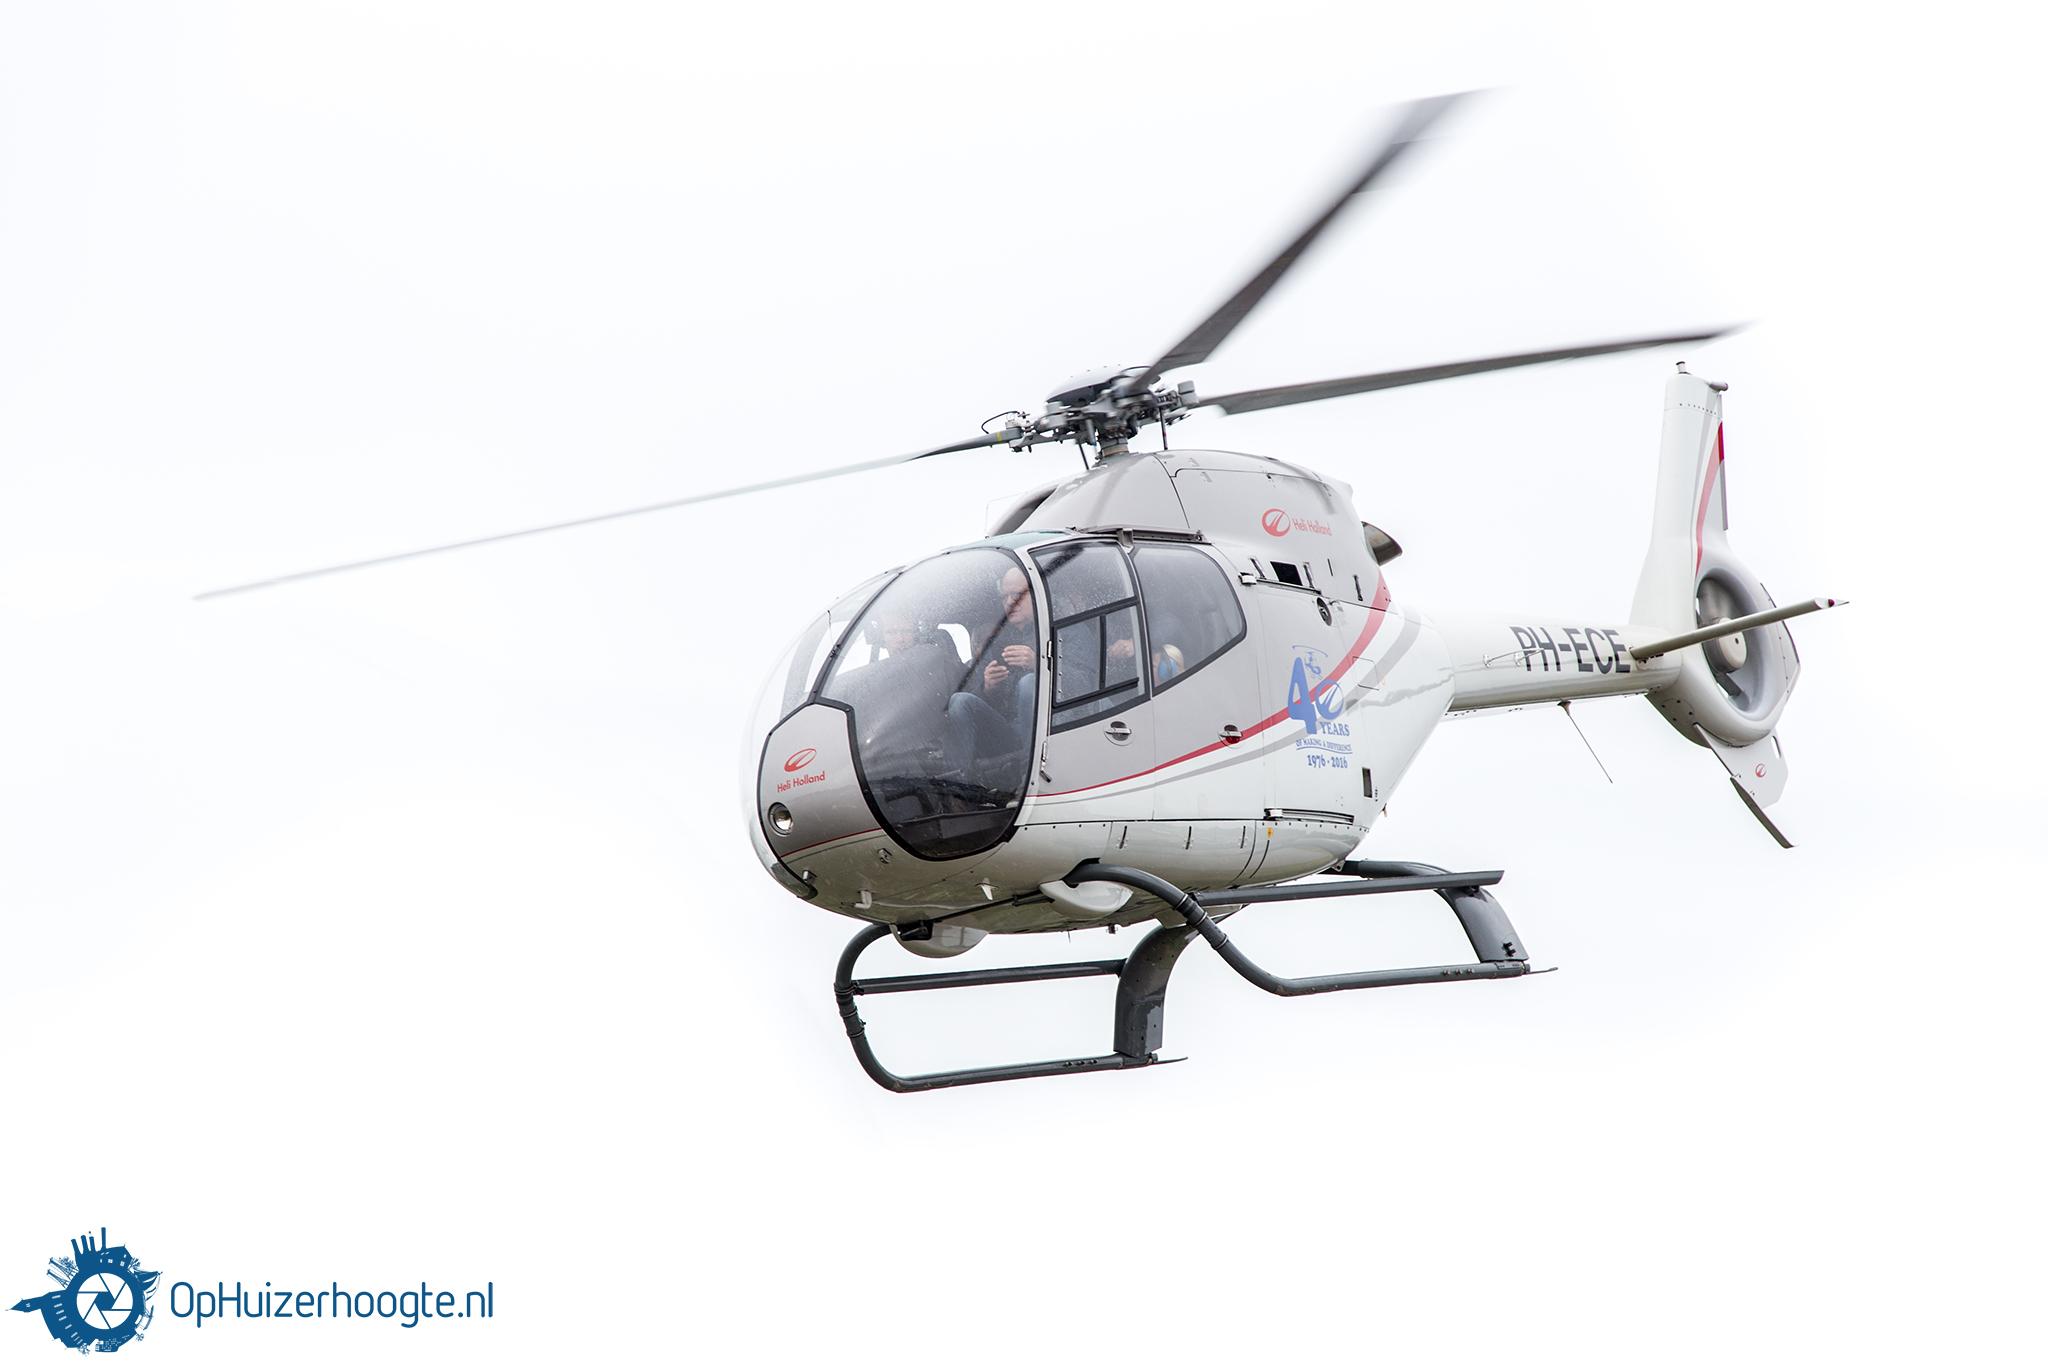 Helikopter Vliegen In Huizen Ophuizerhoogtenl